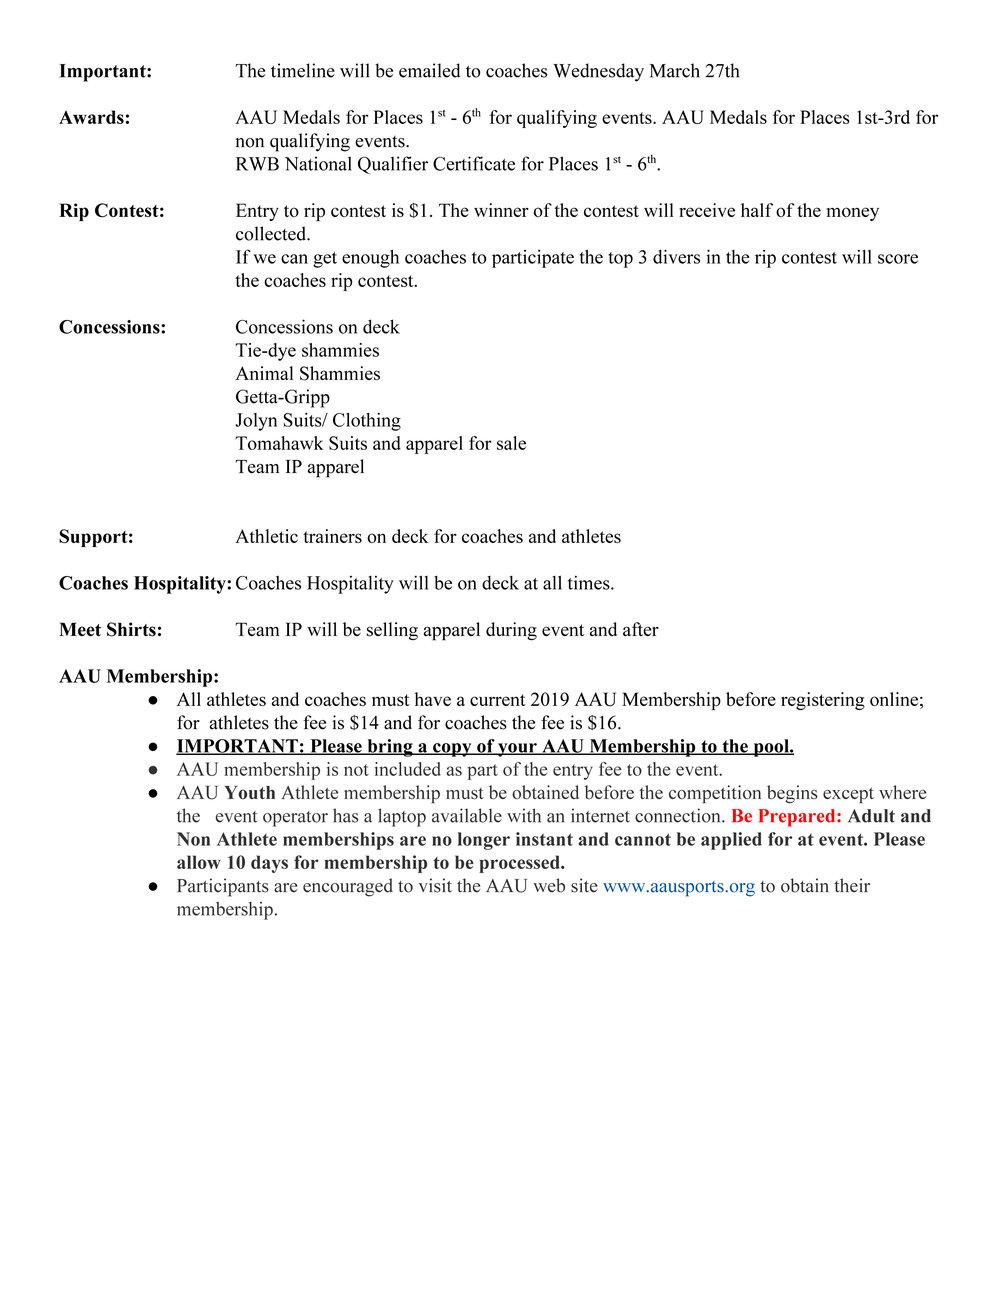 2019 AAU Blue South Qualifier Meet Information-5.jpg